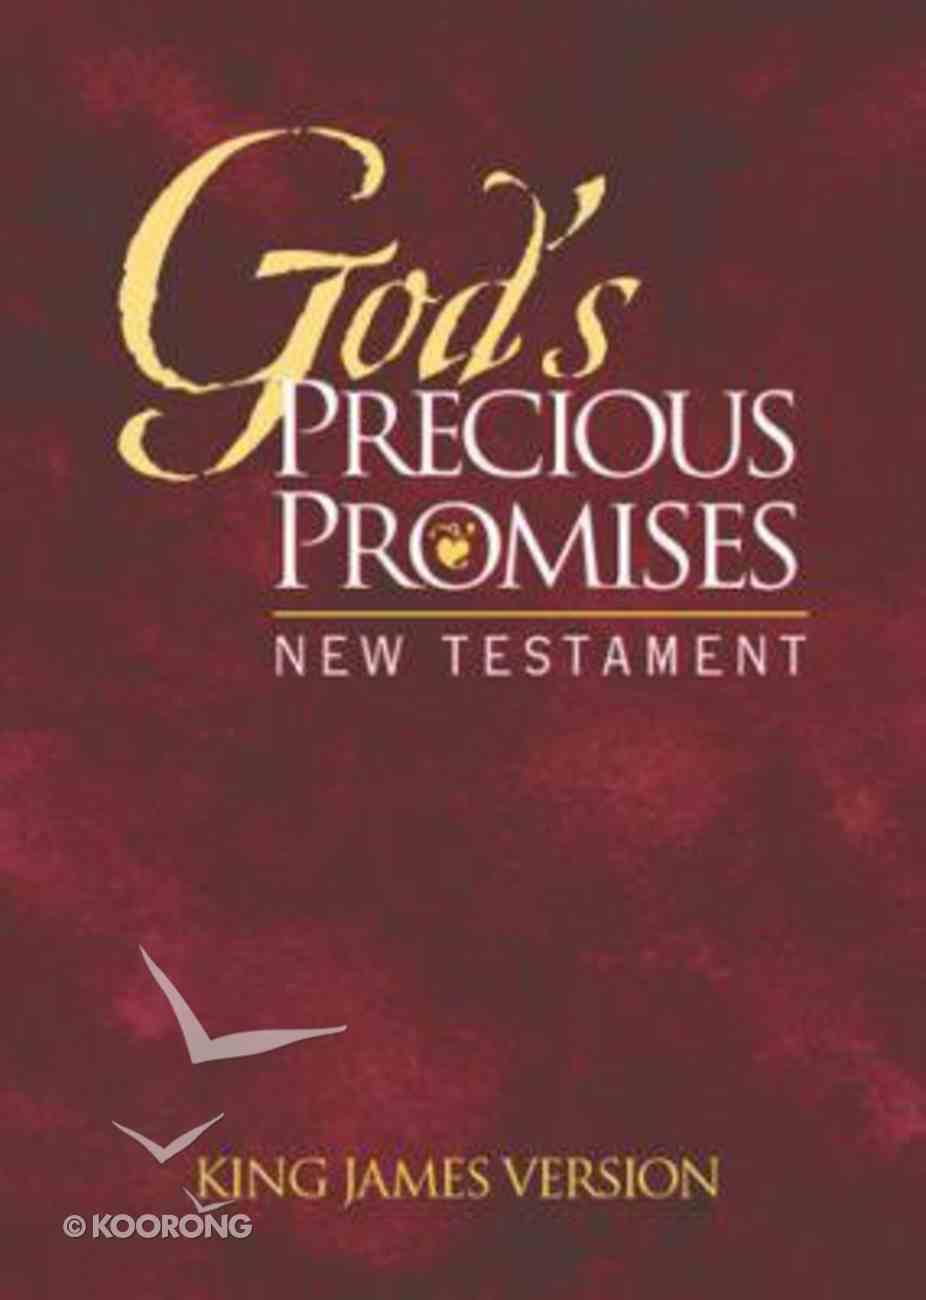 KJV God's Precious Promises New Testament Burgundy Paperback